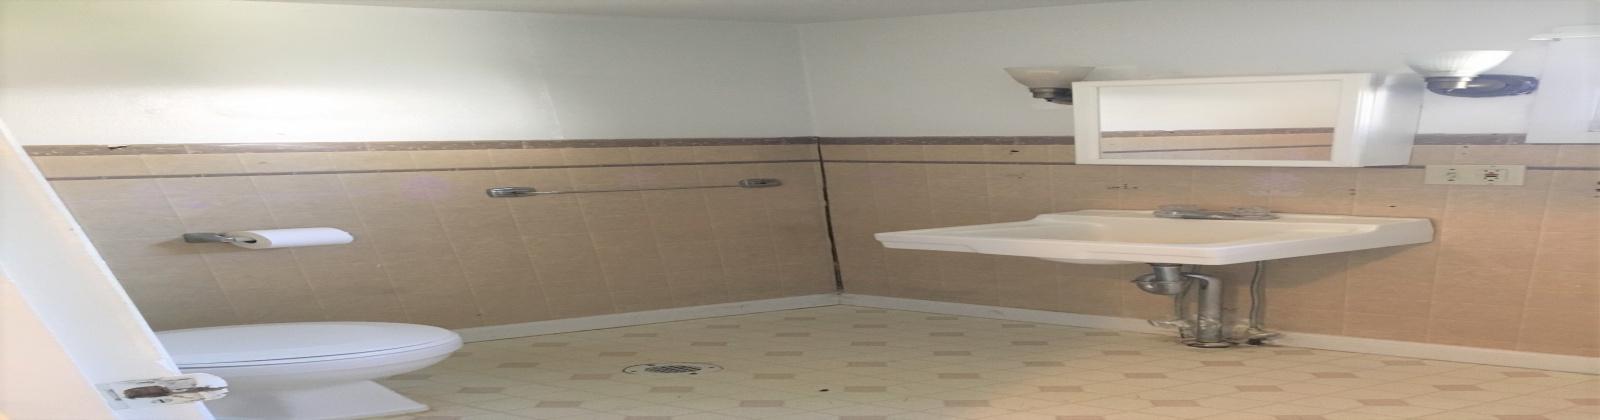 19 Hudson Avenue APT 2 Athens, Ohio, 1 Bedroom Bedrooms, ,1 BathroomBathrooms,Apartment,For Rent,Hudson,1075